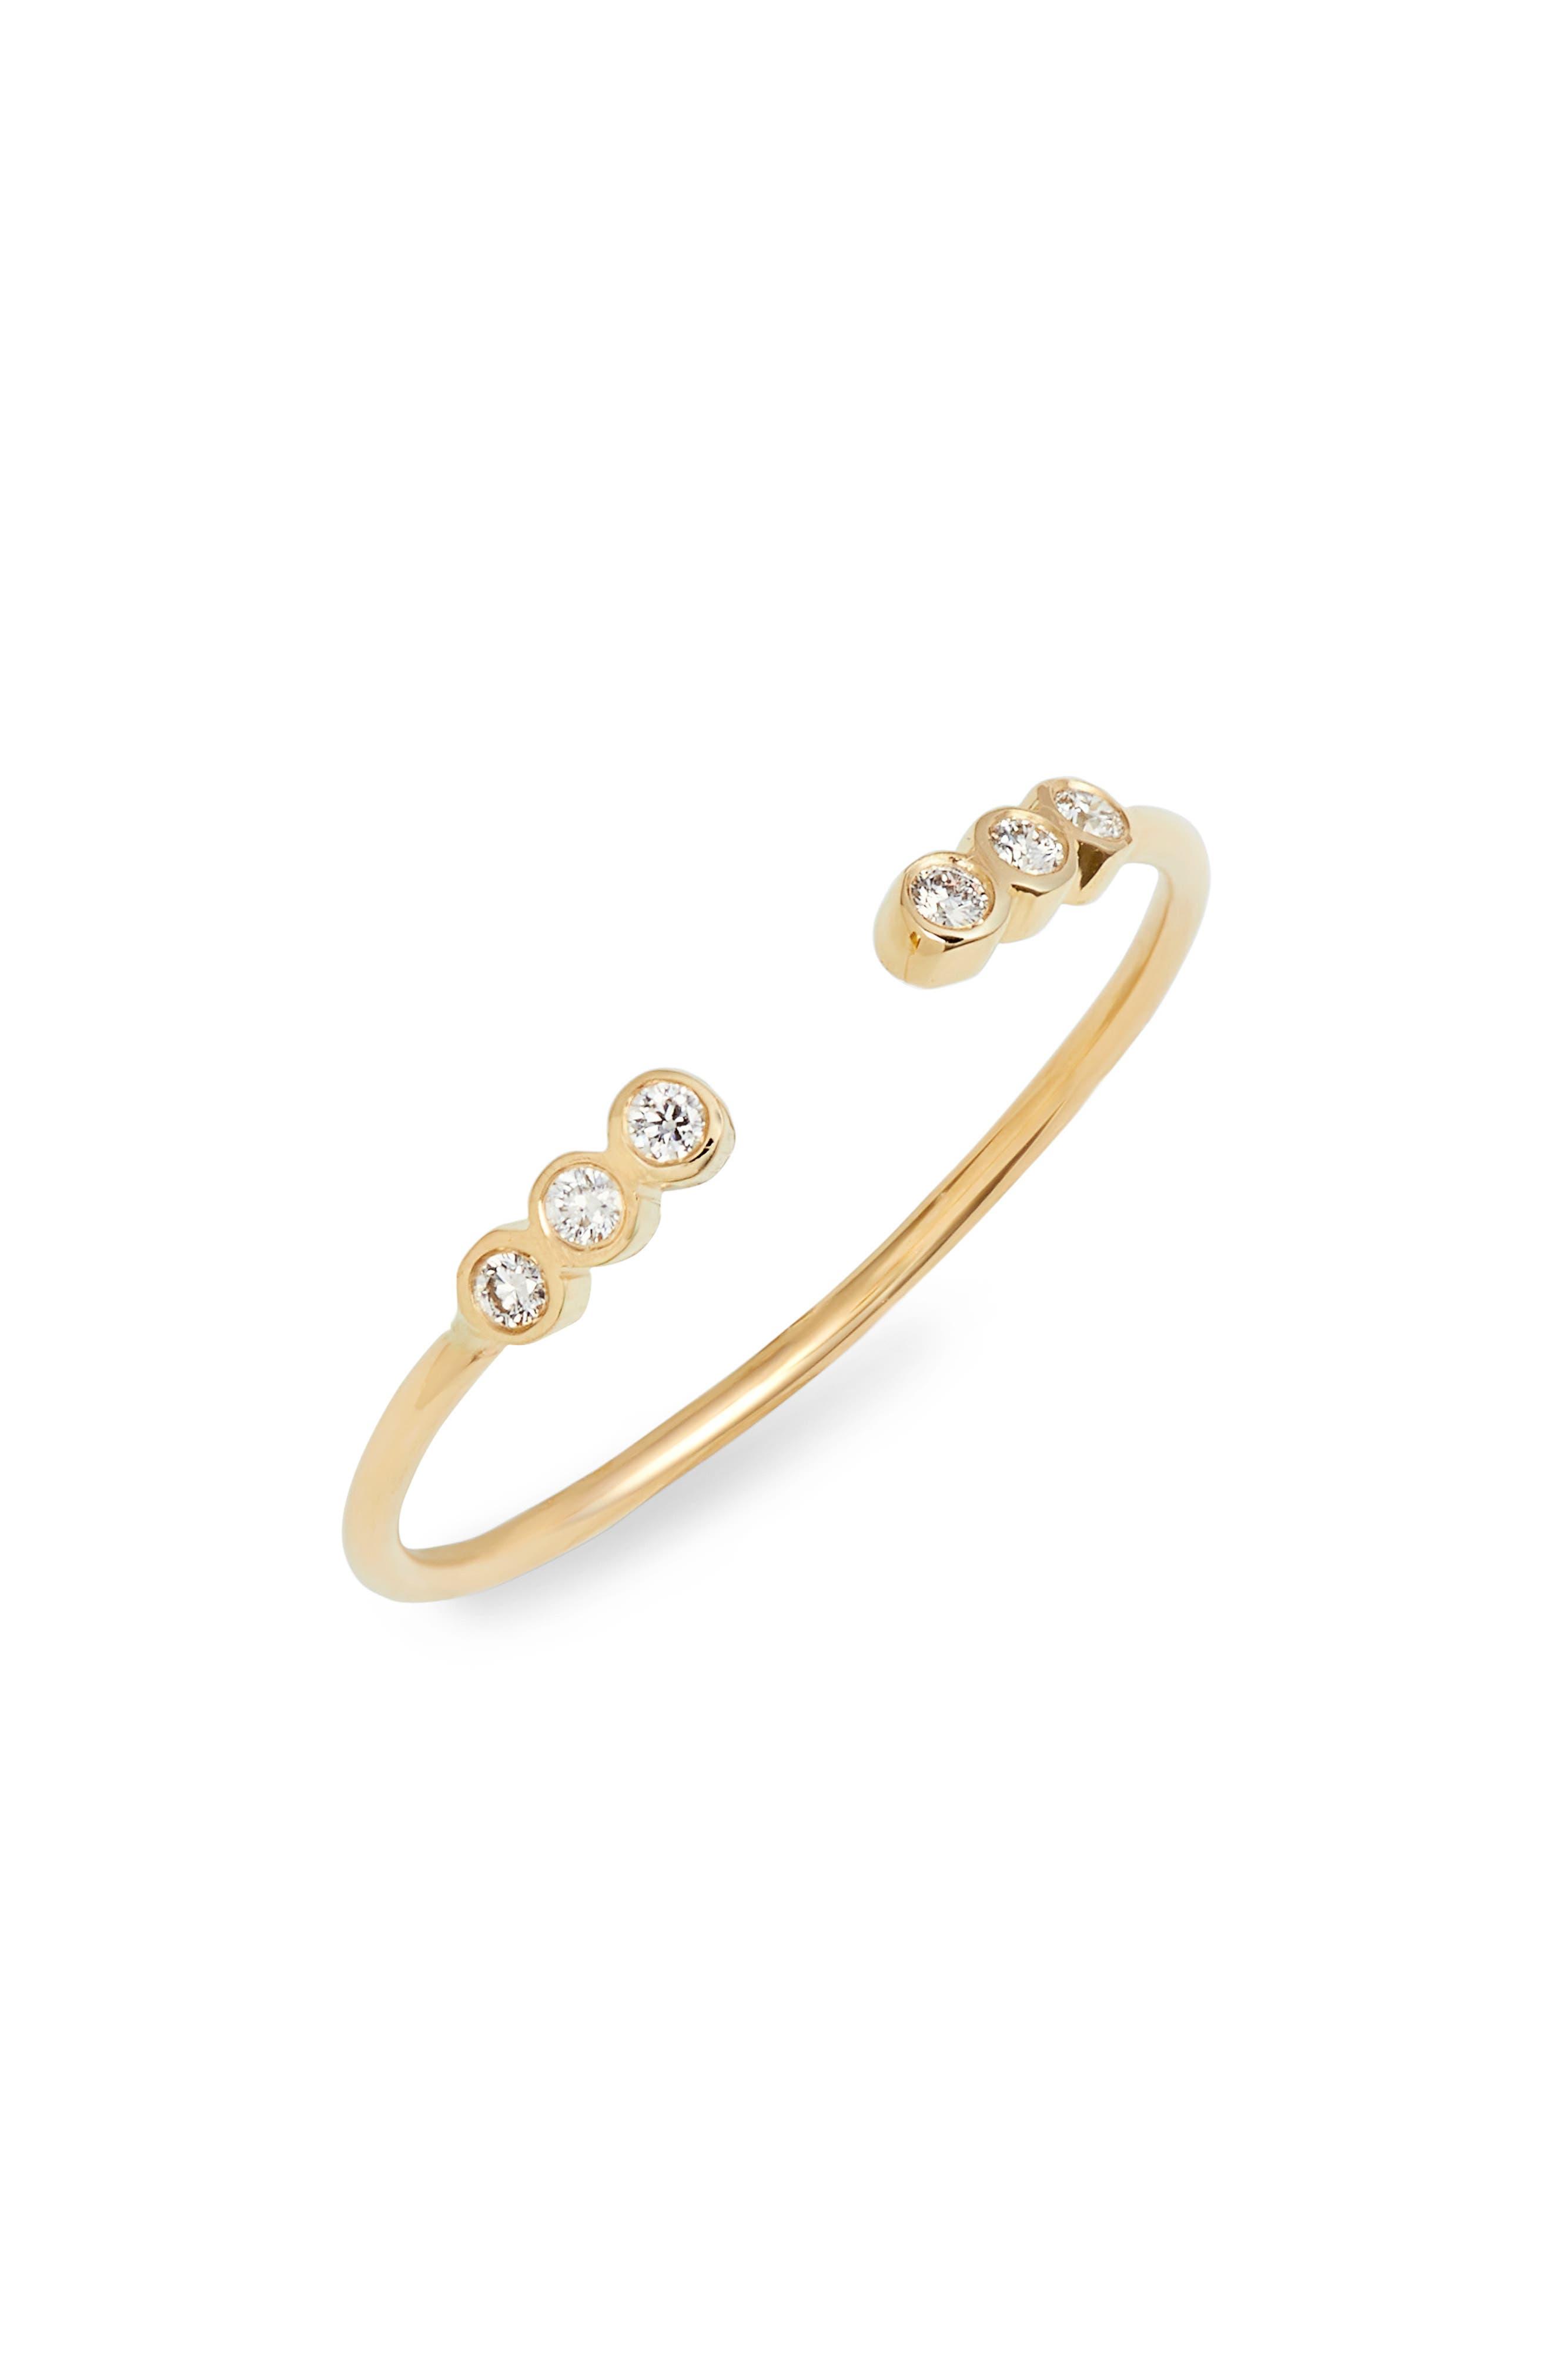 Zoë Chicco Six Diamond Bezel Open Stackable Ring